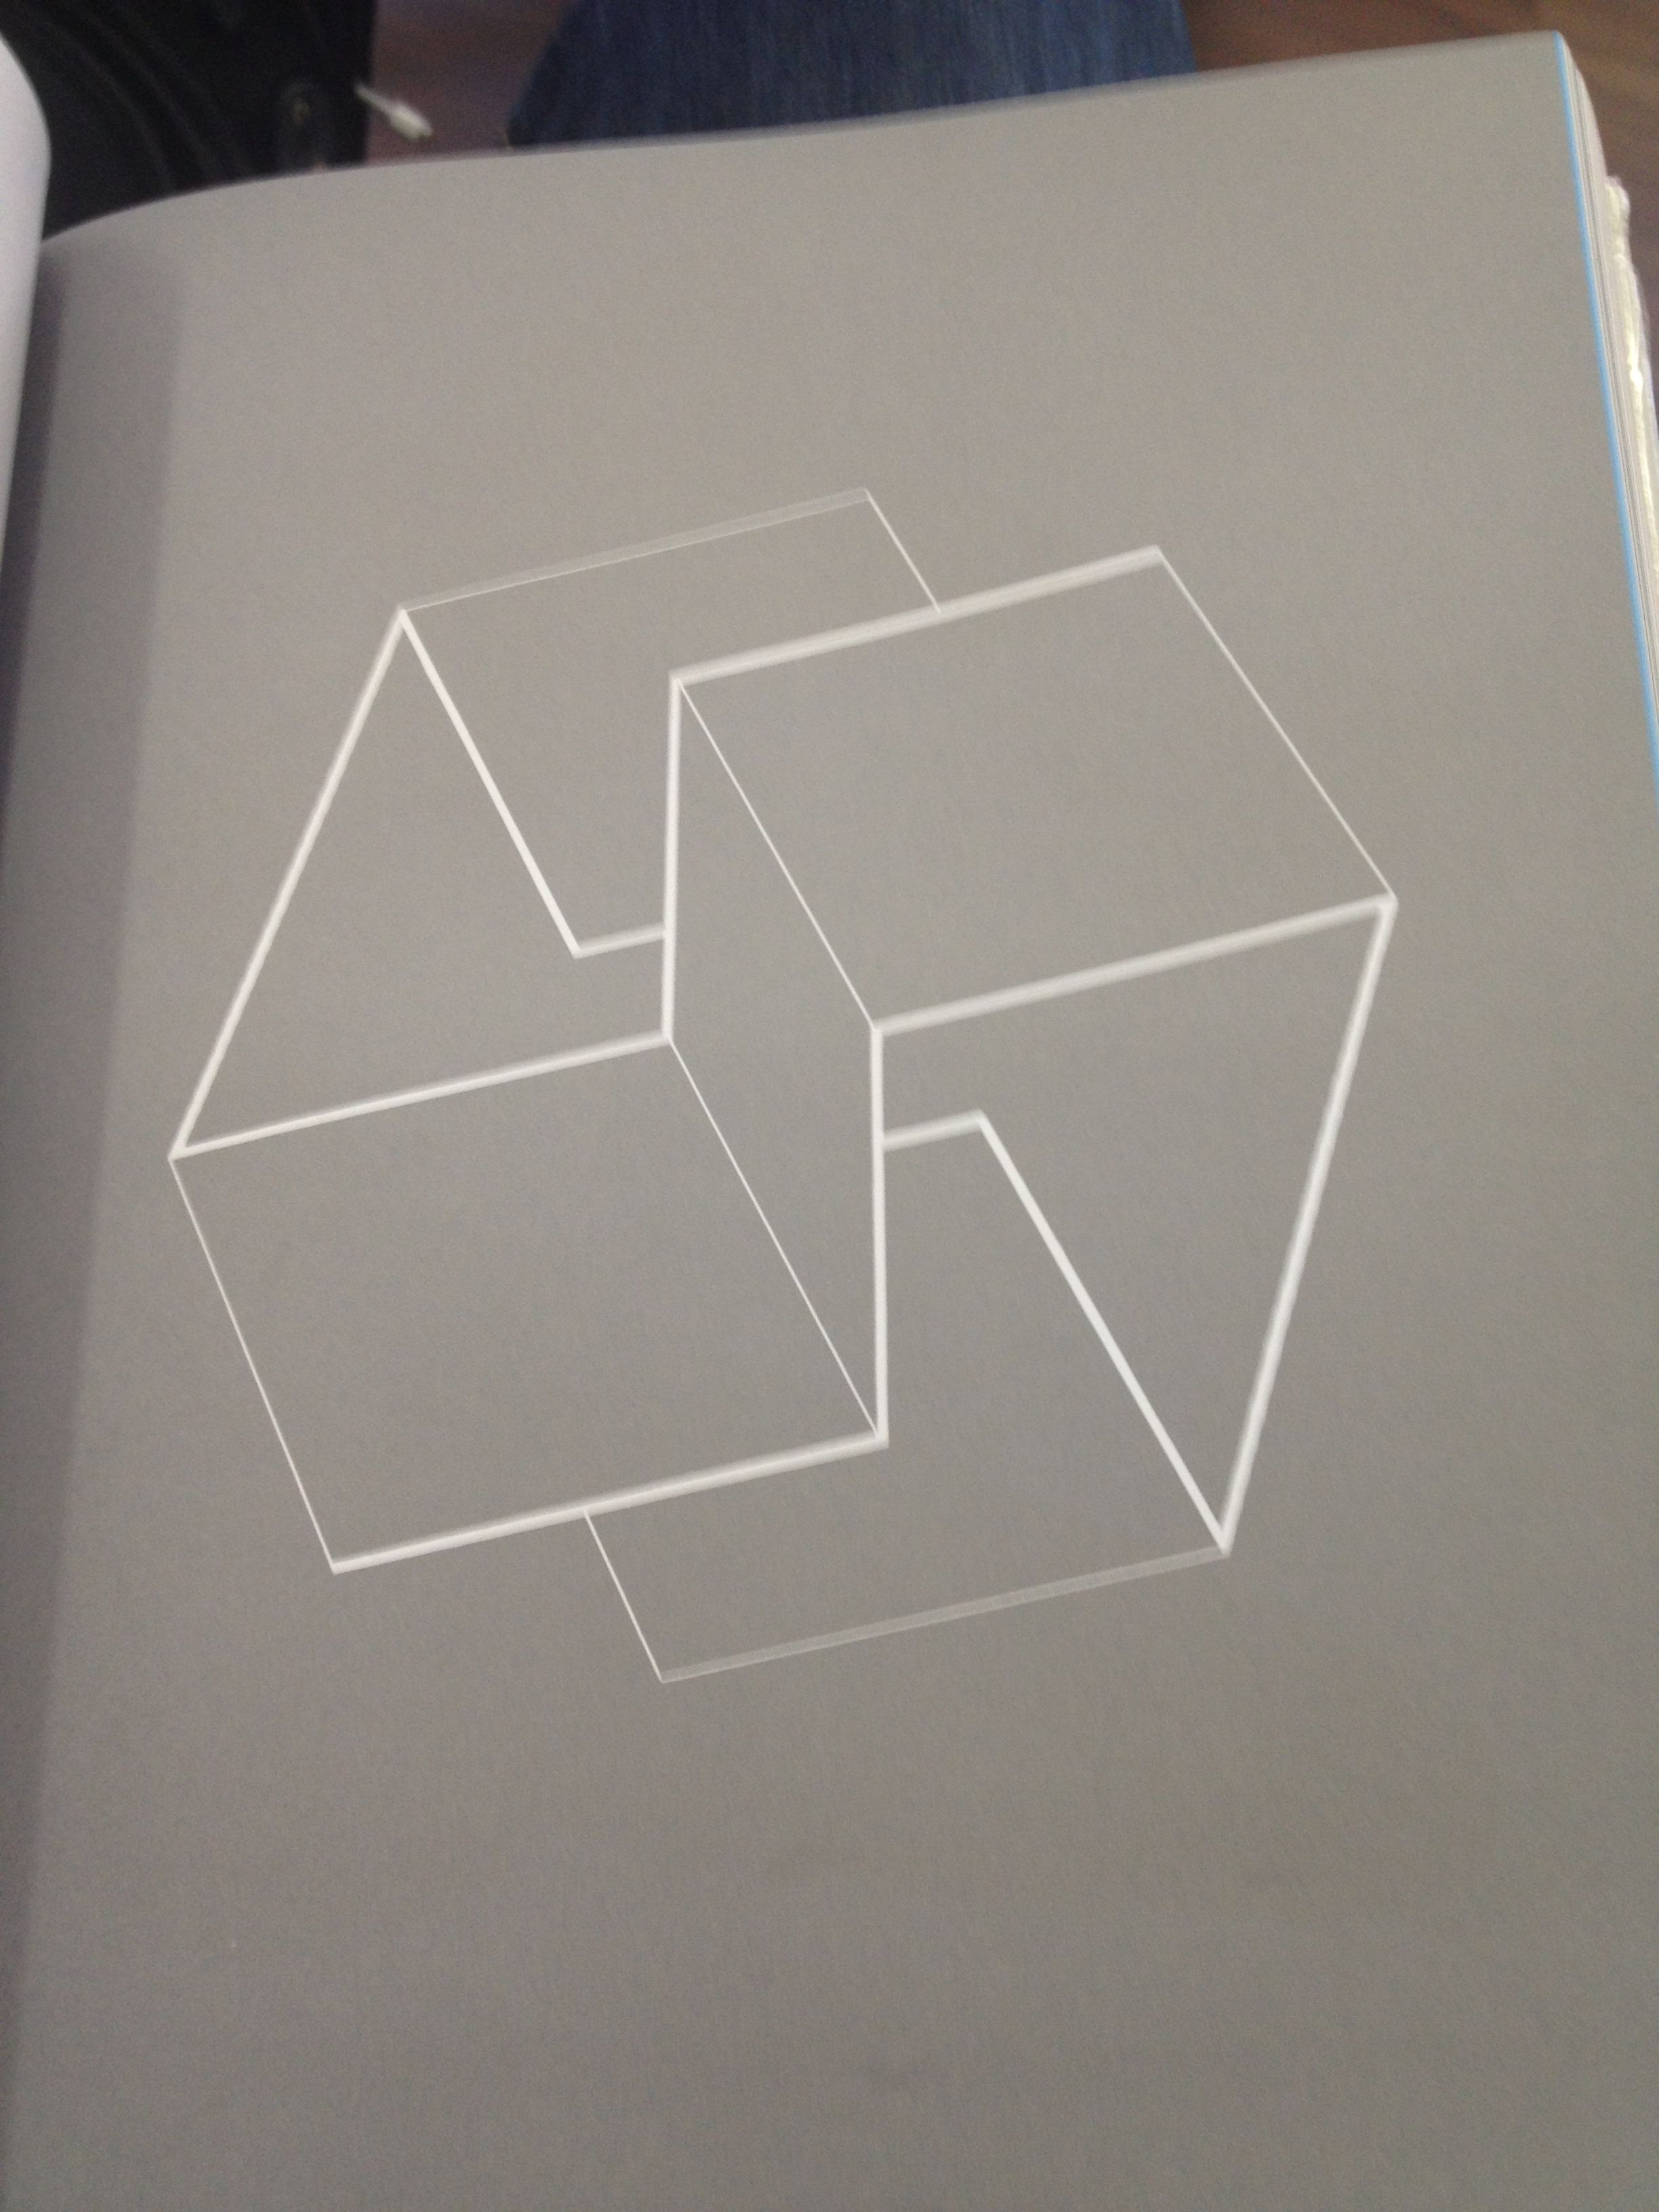 A shape from alan fletchers book the art of looking sideways